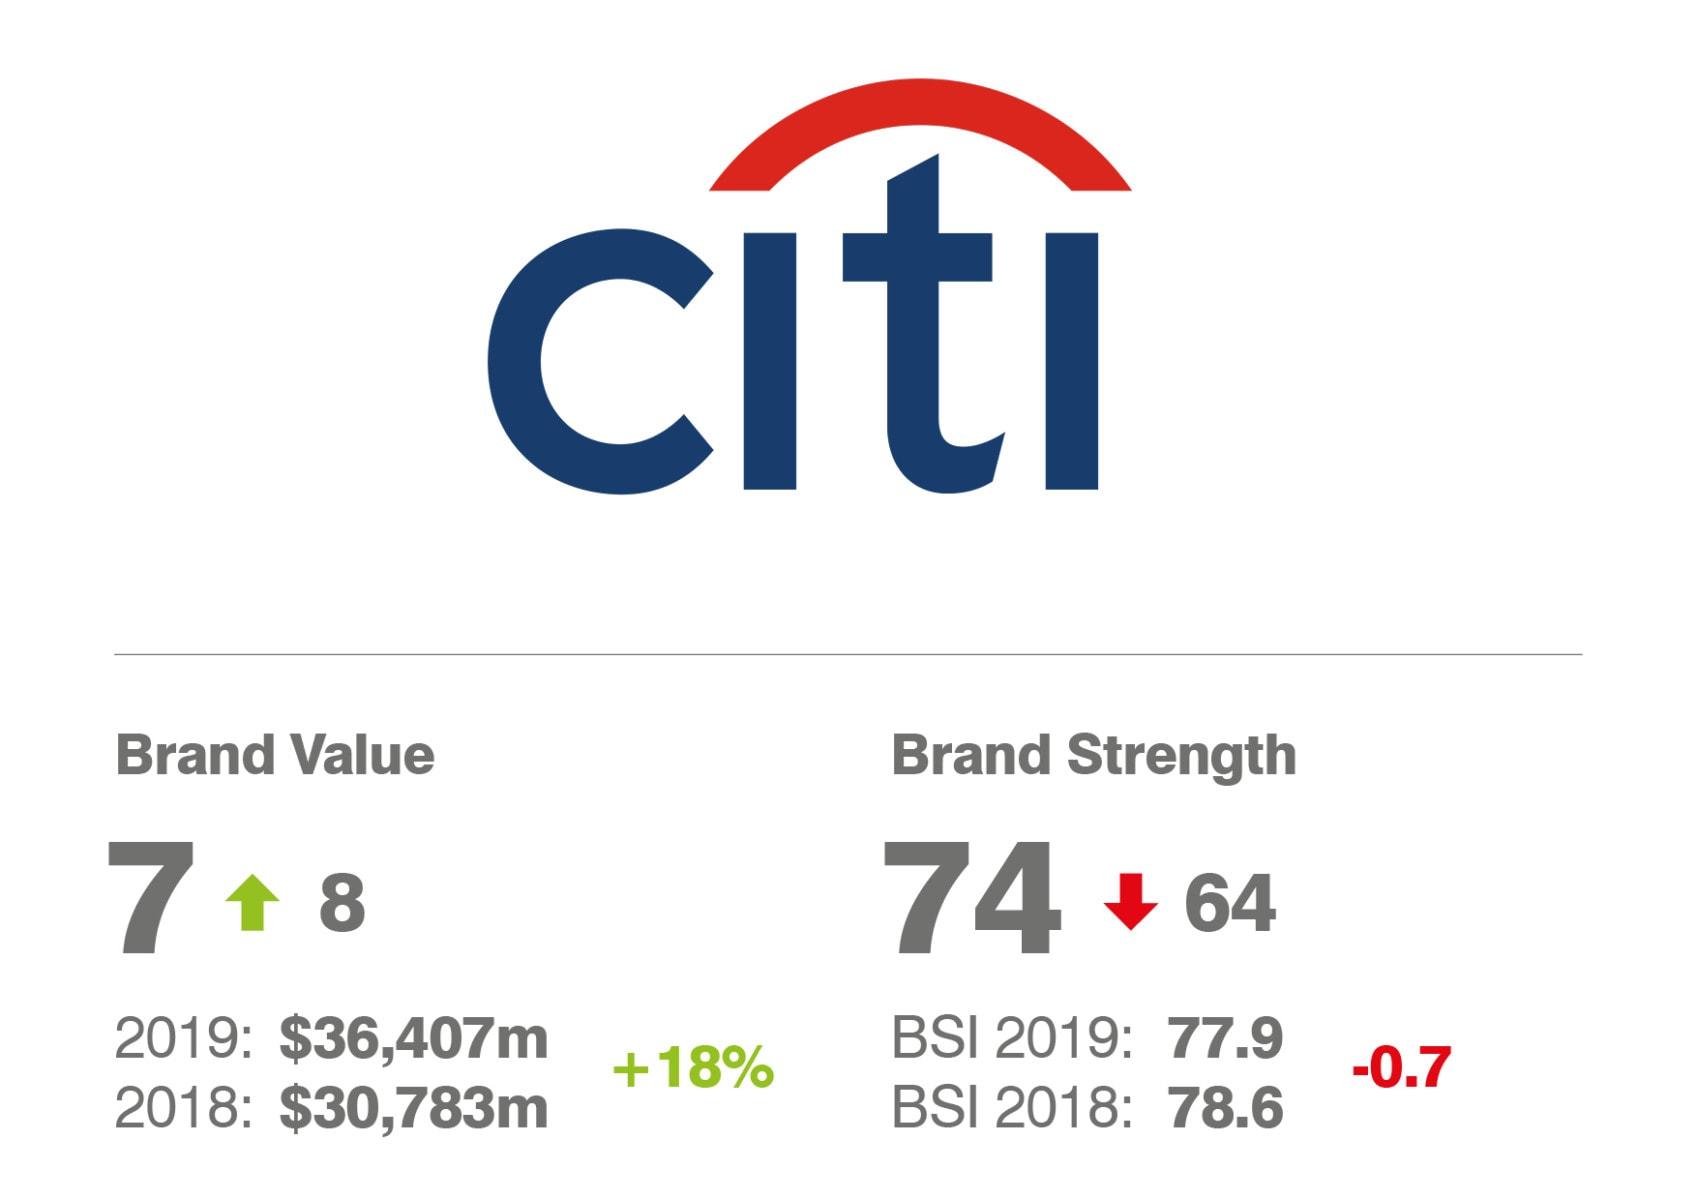 Citi: Brand Value and Brand Strength